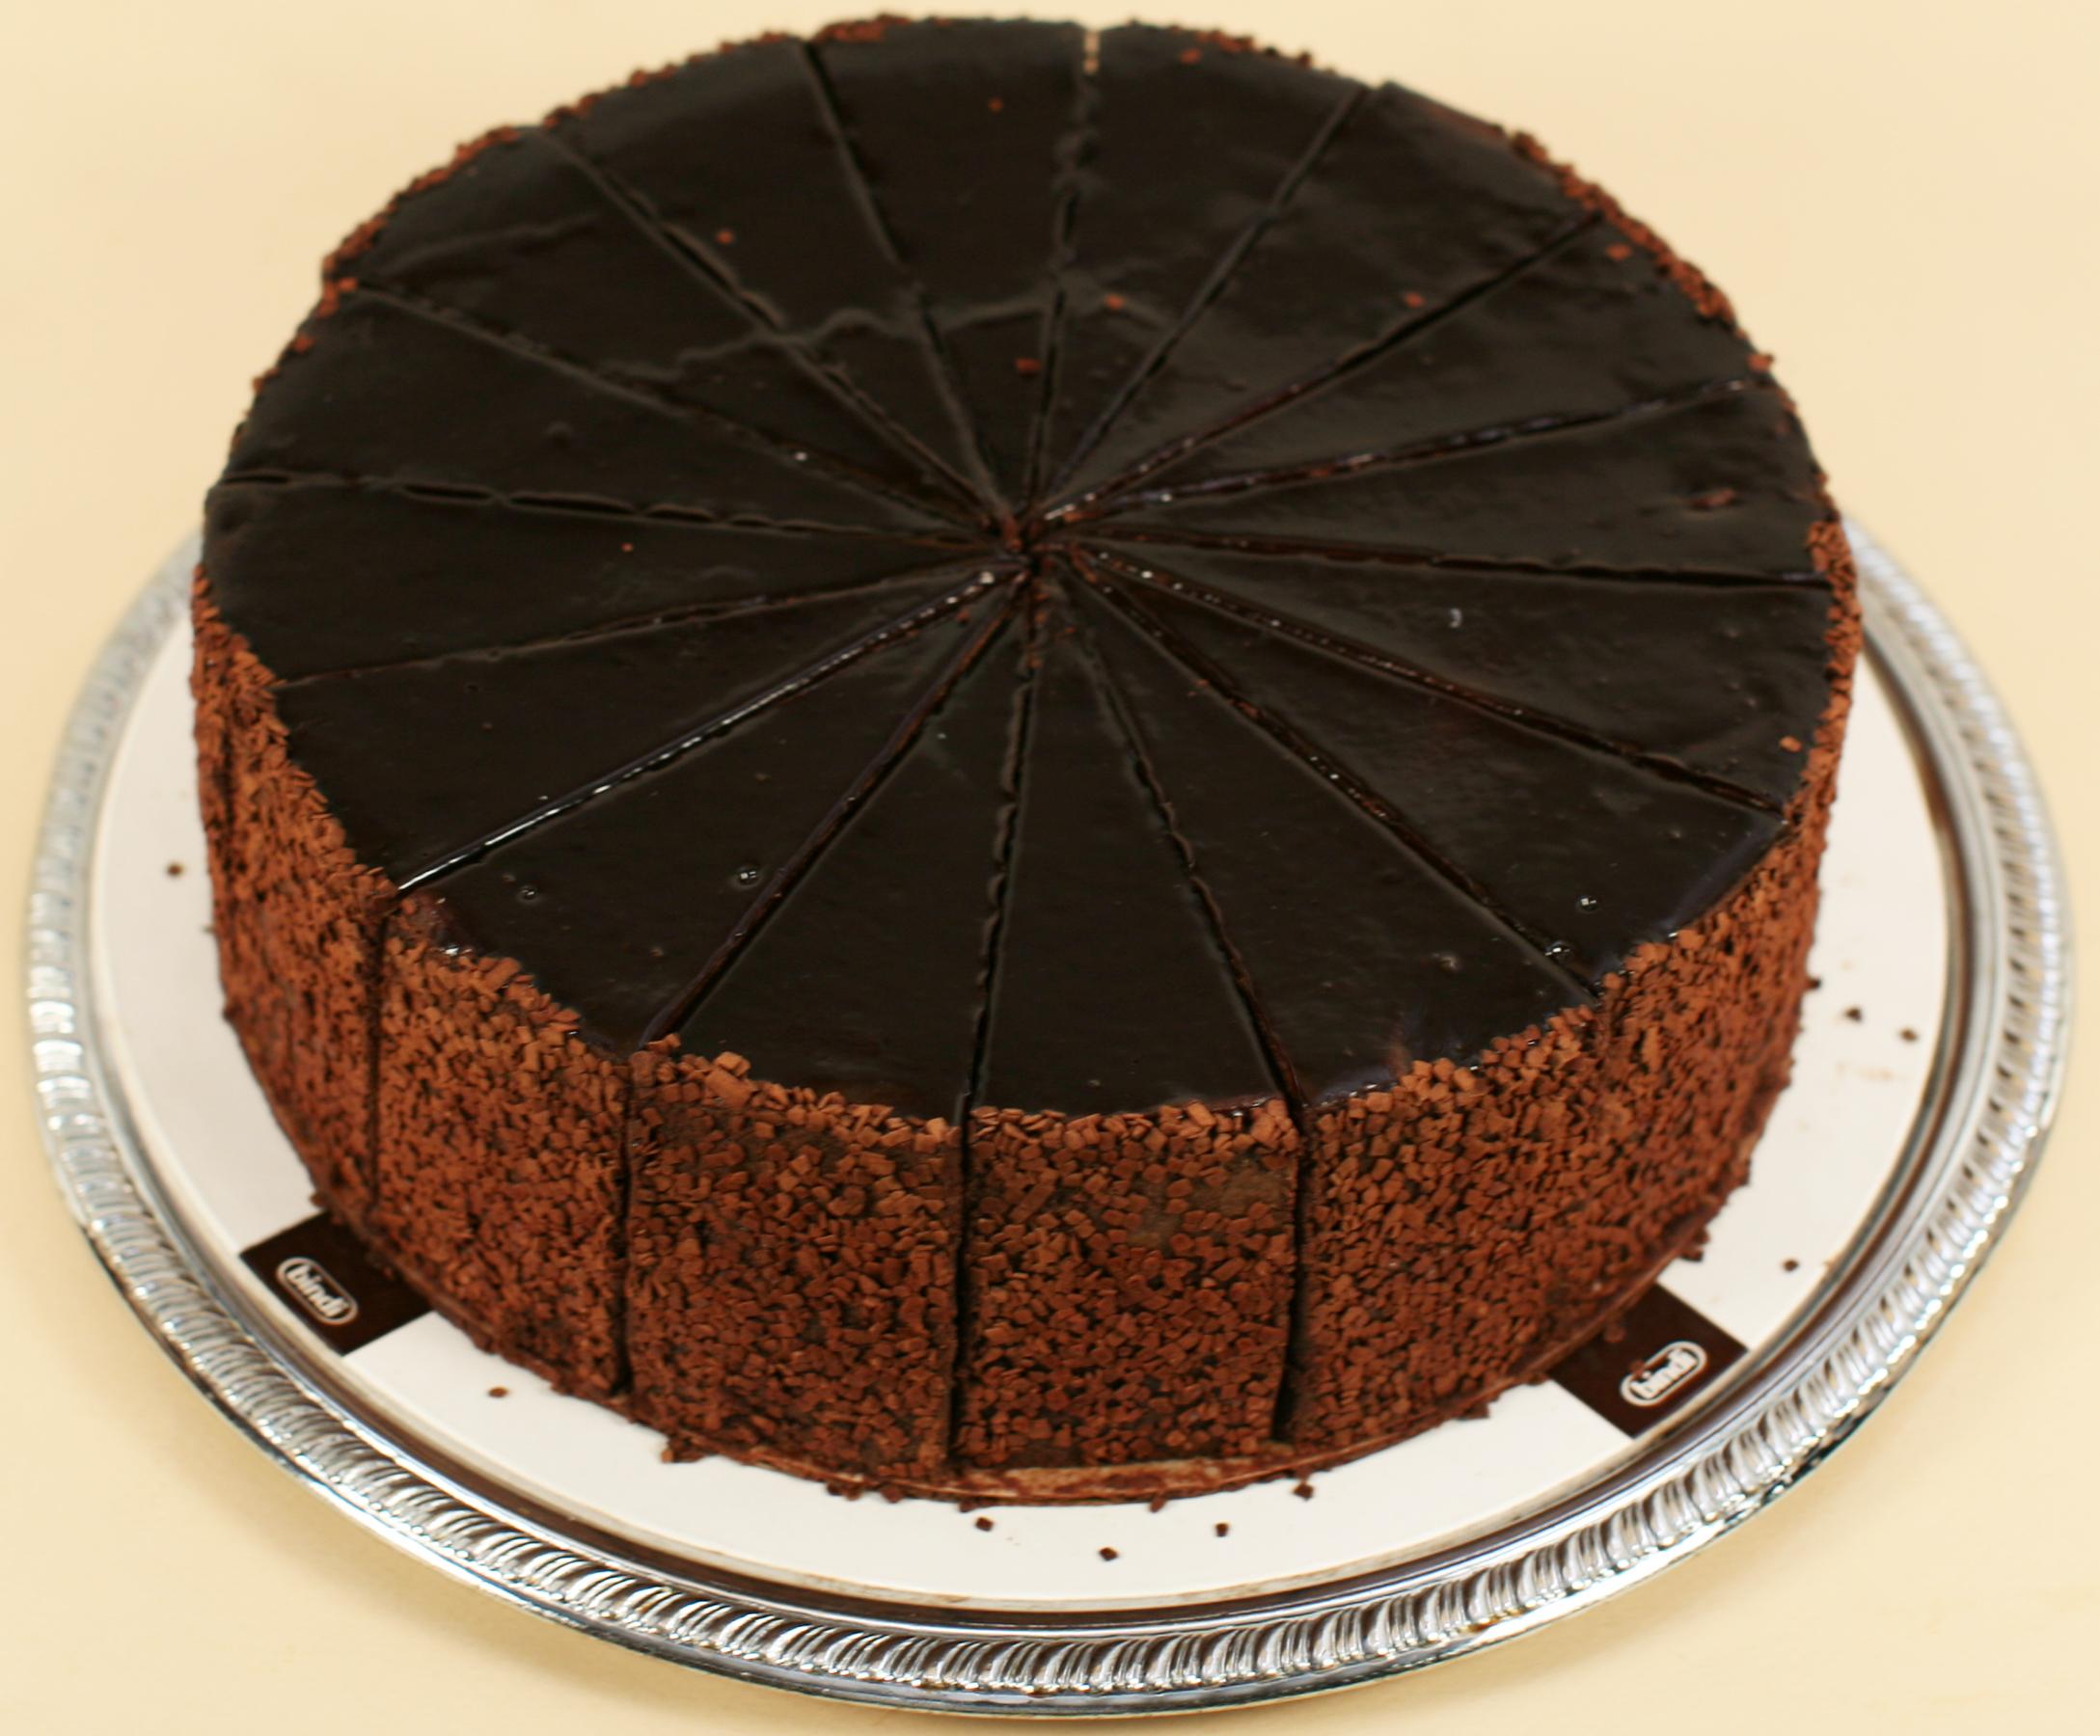 a-CHOCOLATE FONDANT CAKE